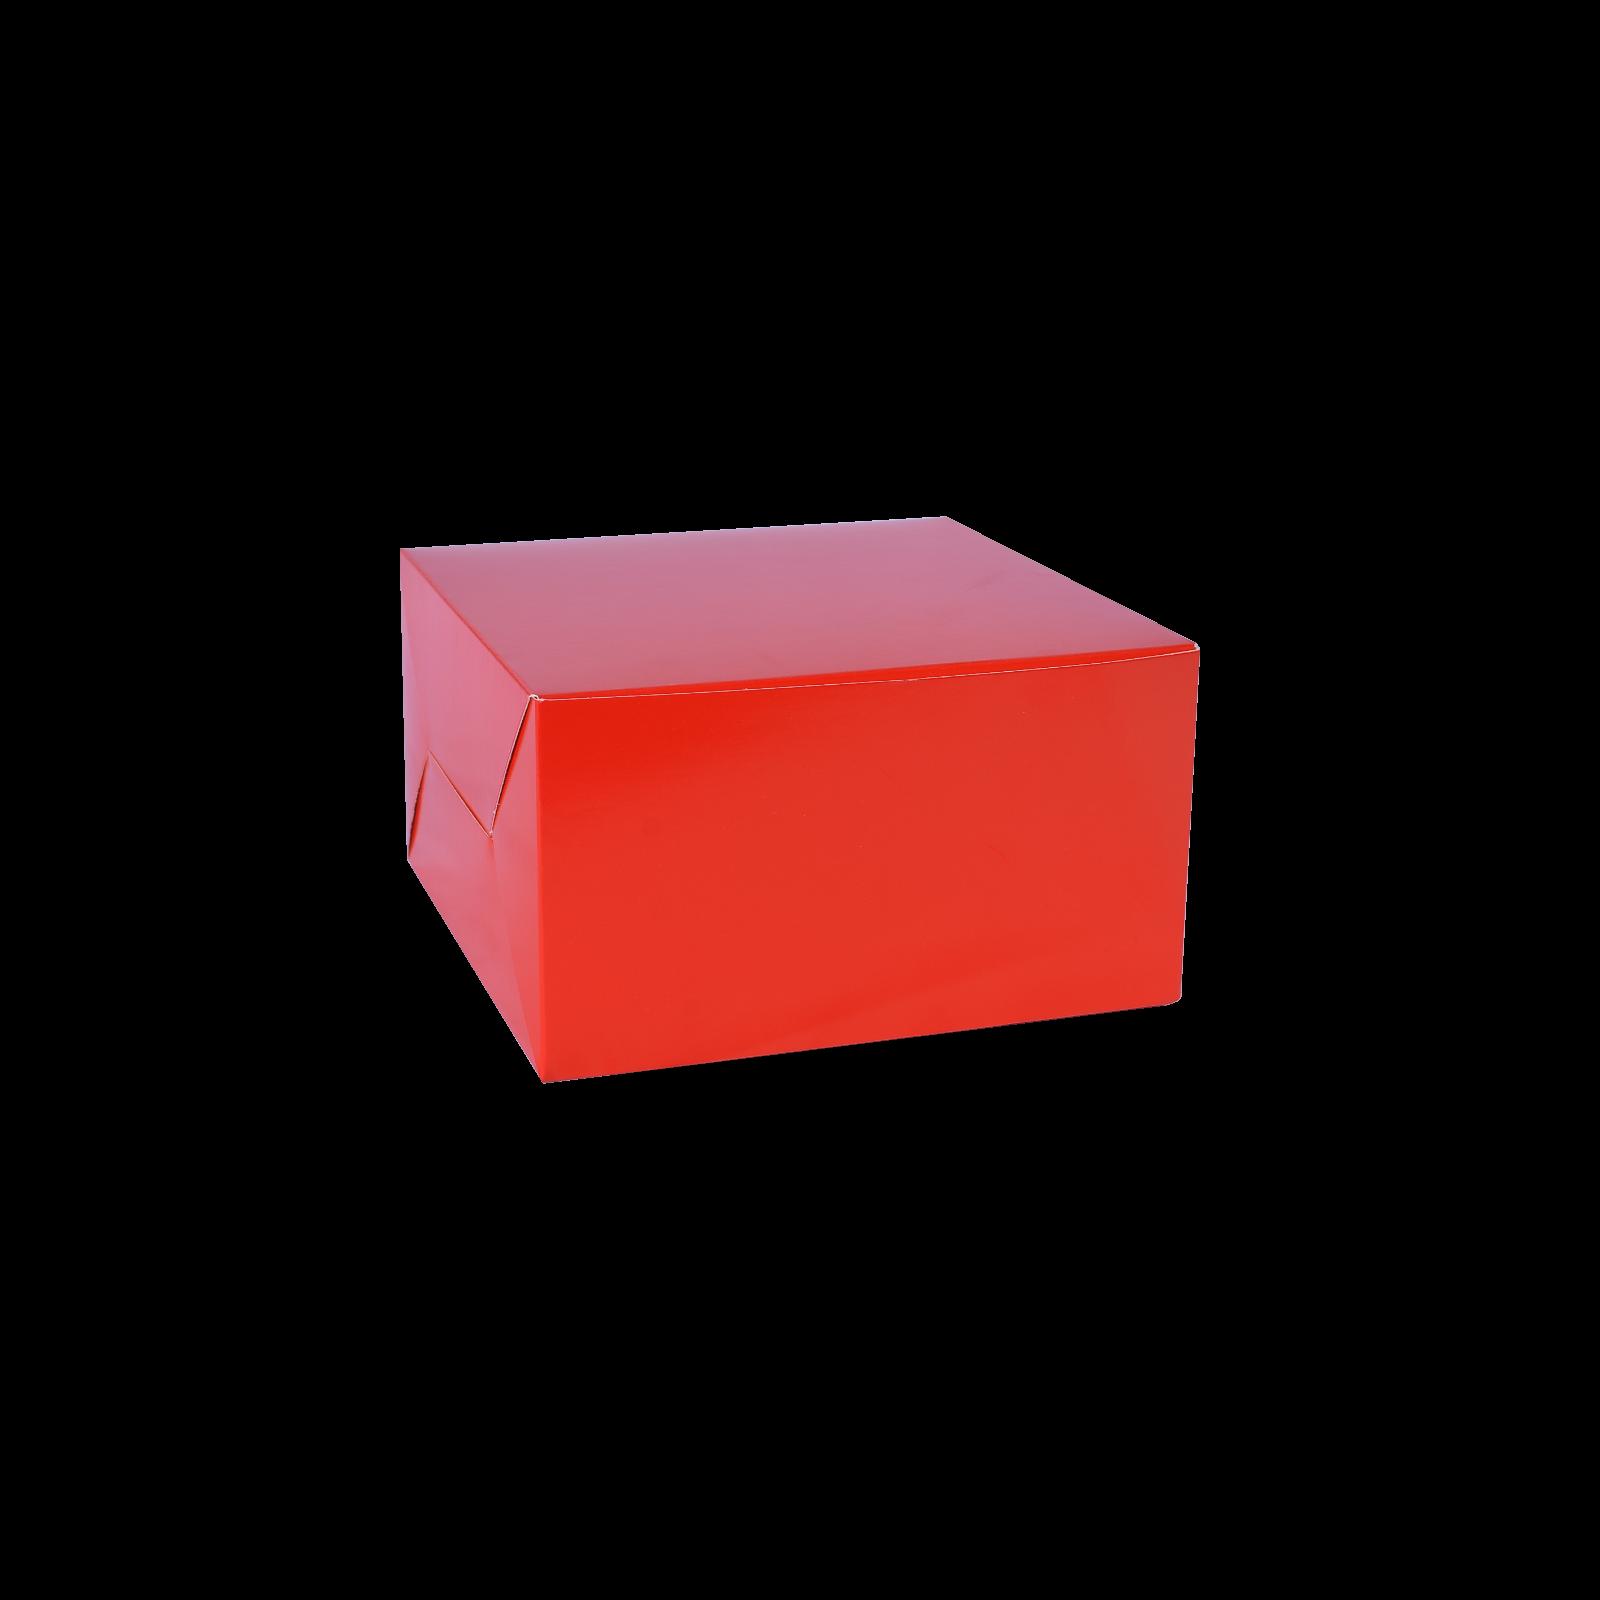 Cake Box 7' x 7' x 4' Red.png